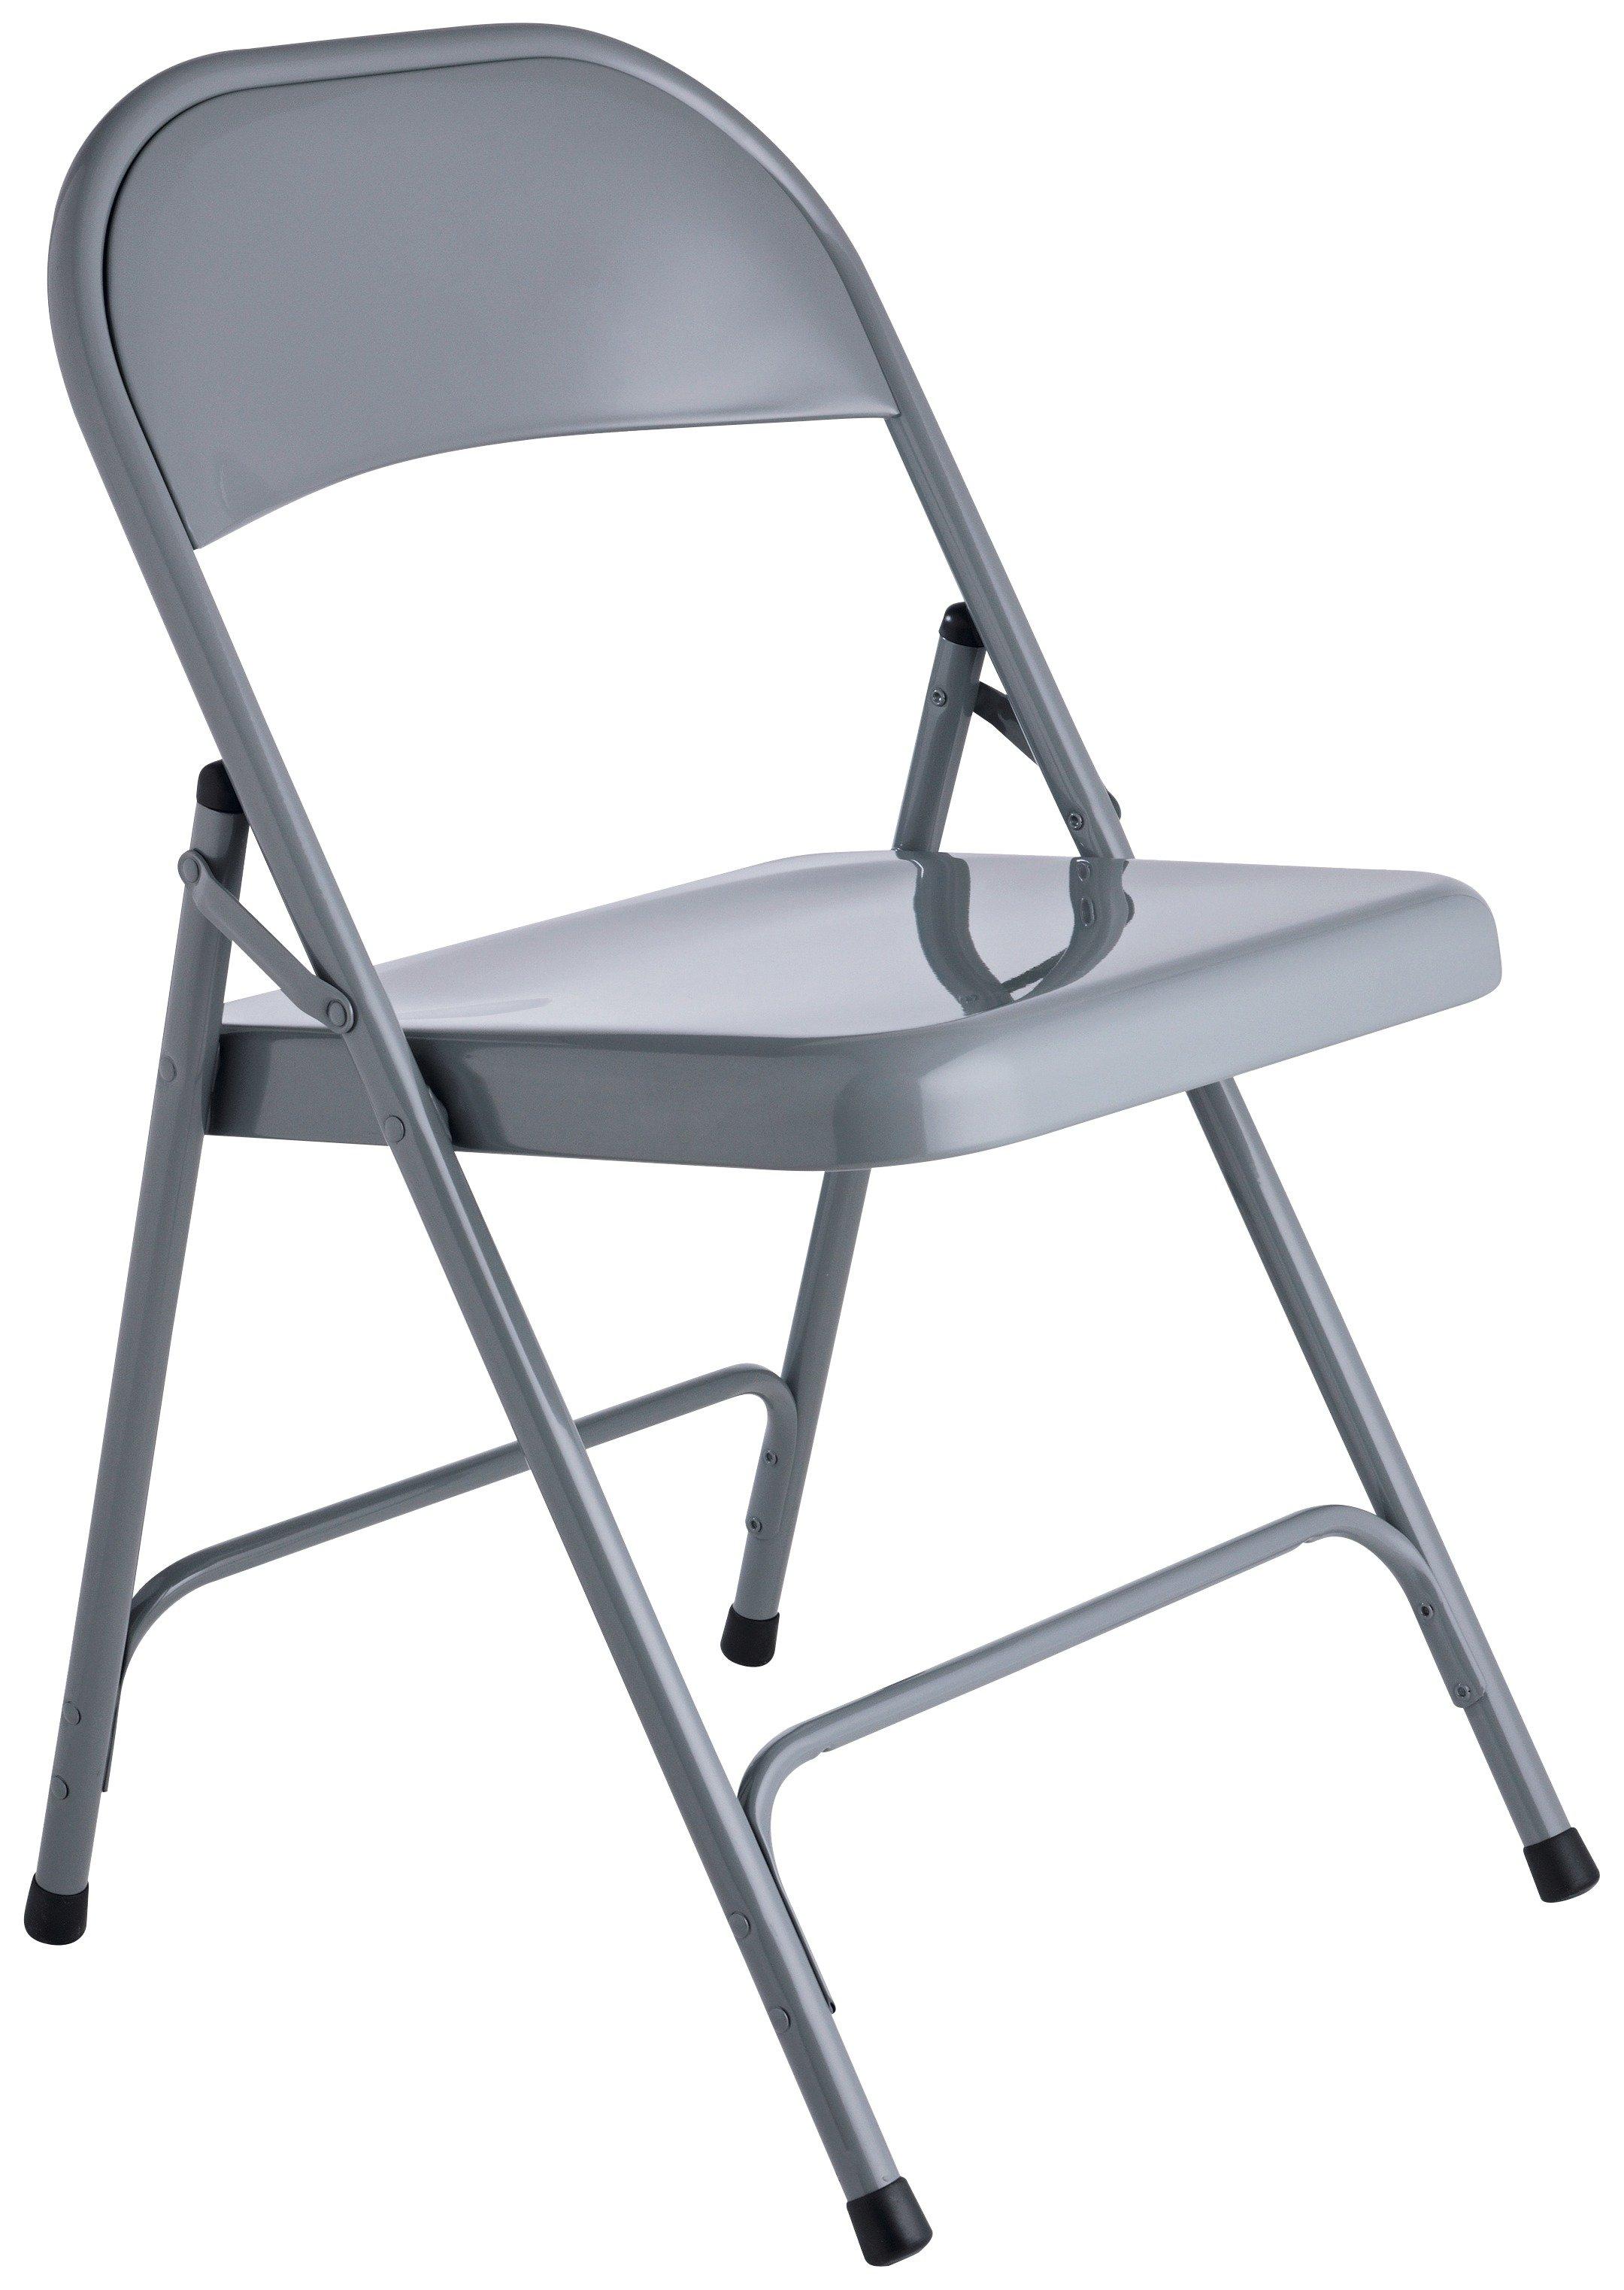 Habitat Macadam Metal Folding Chair - Grey